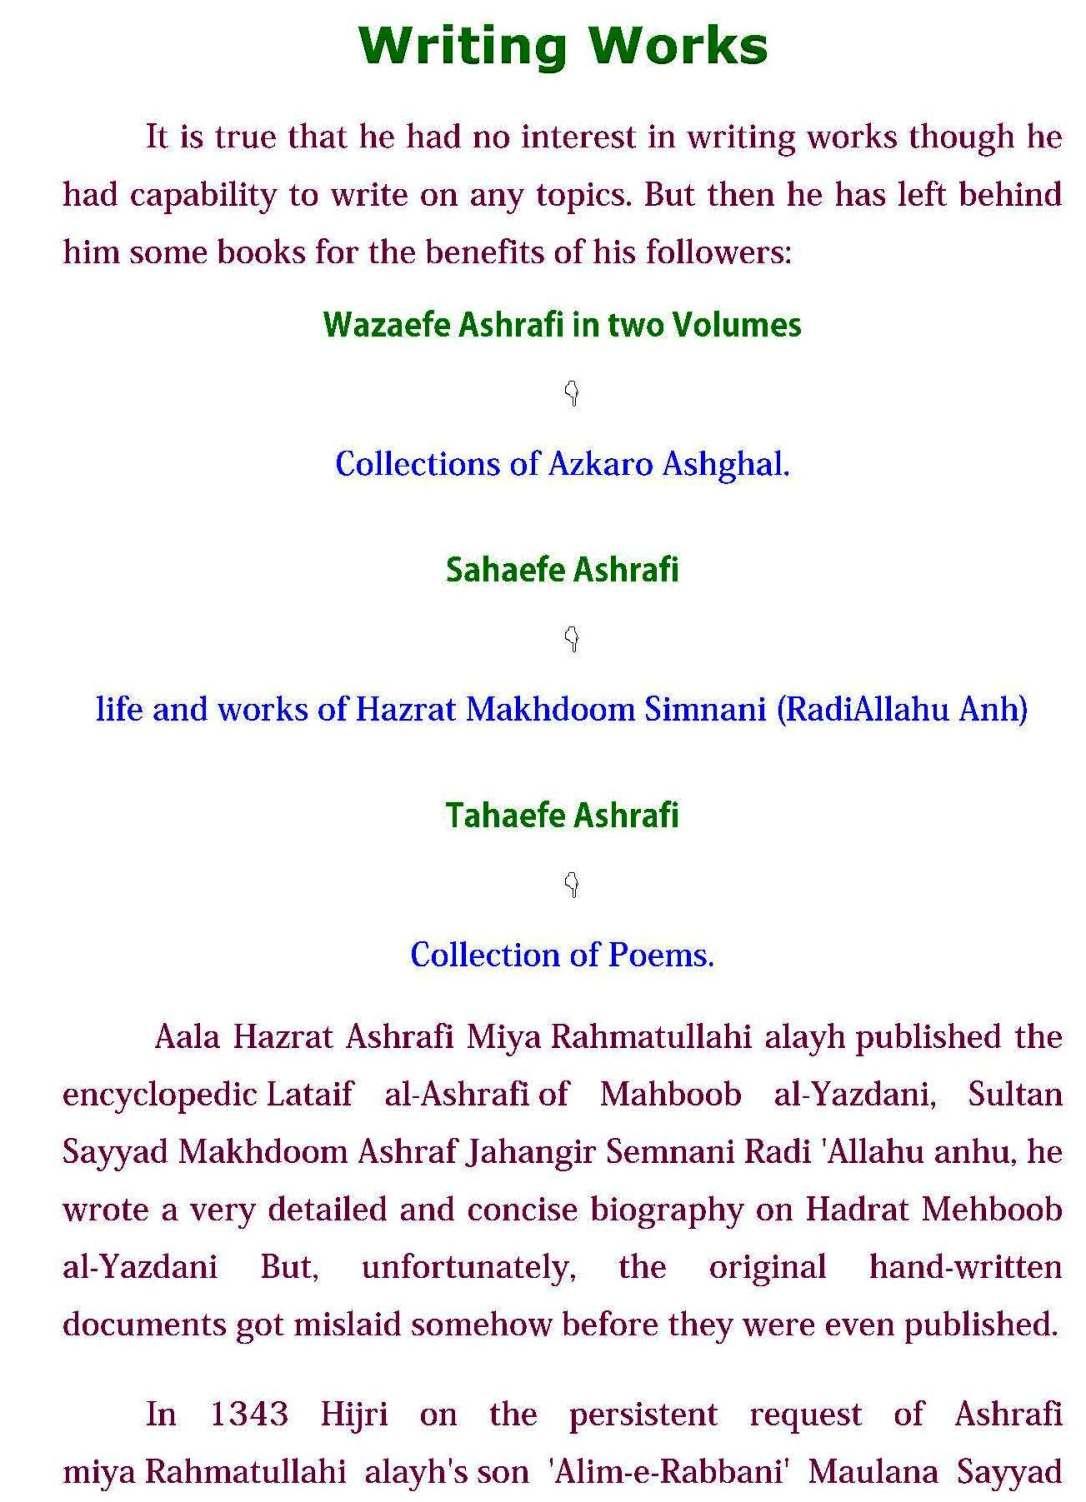 Aala Hazrat-13